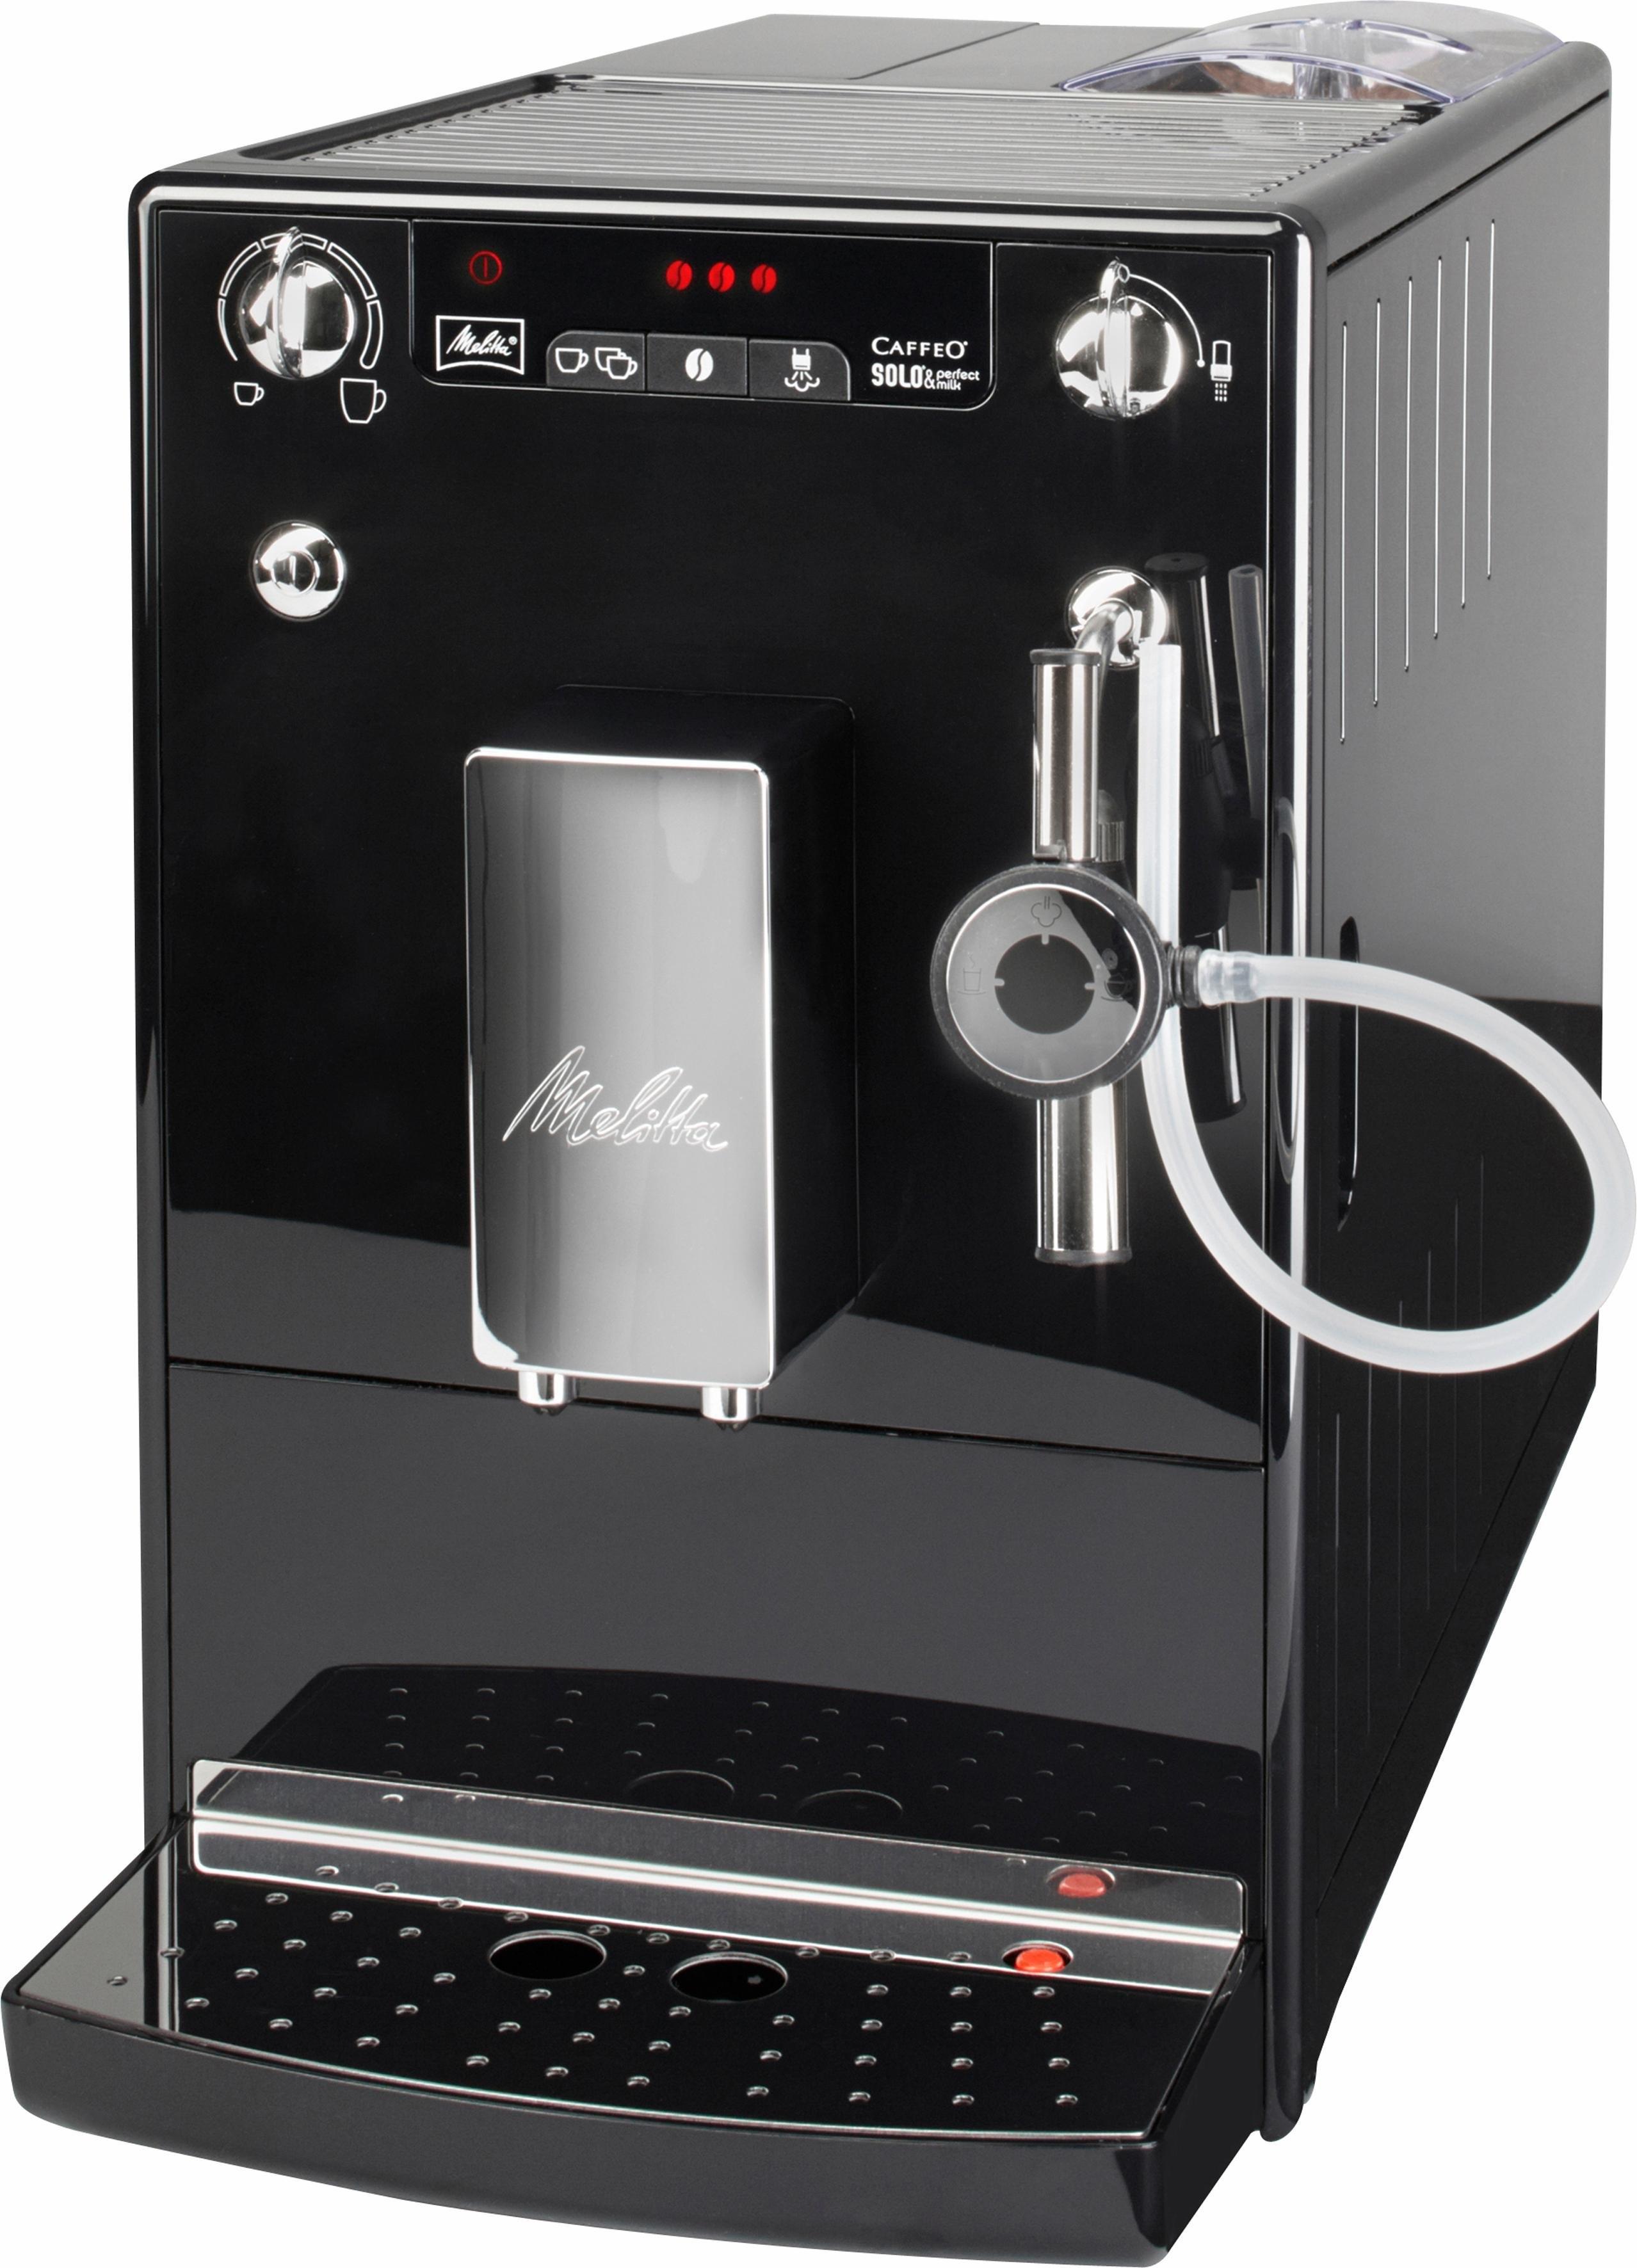 melitta volautomatisch koffiezetapparaat caffeo solo e 957 101 zwart online verkrijgbaar otto. Black Bedroom Furniture Sets. Home Design Ideas